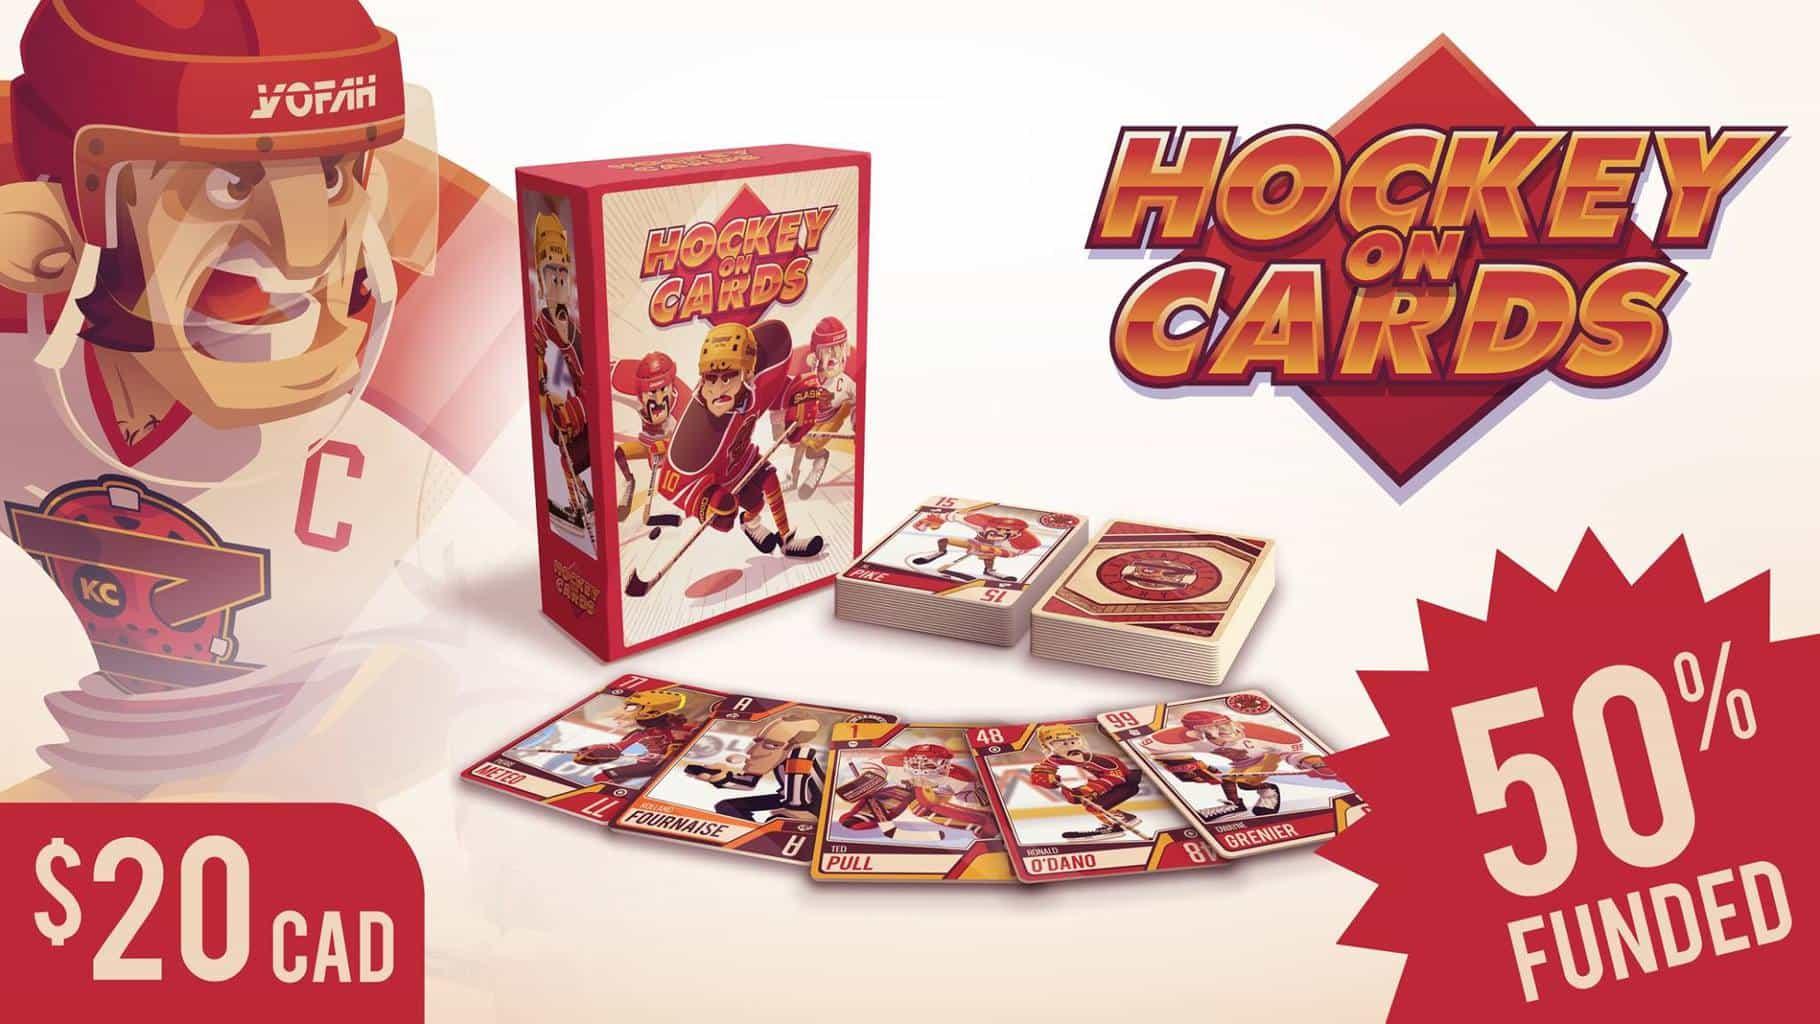 hockey on cards